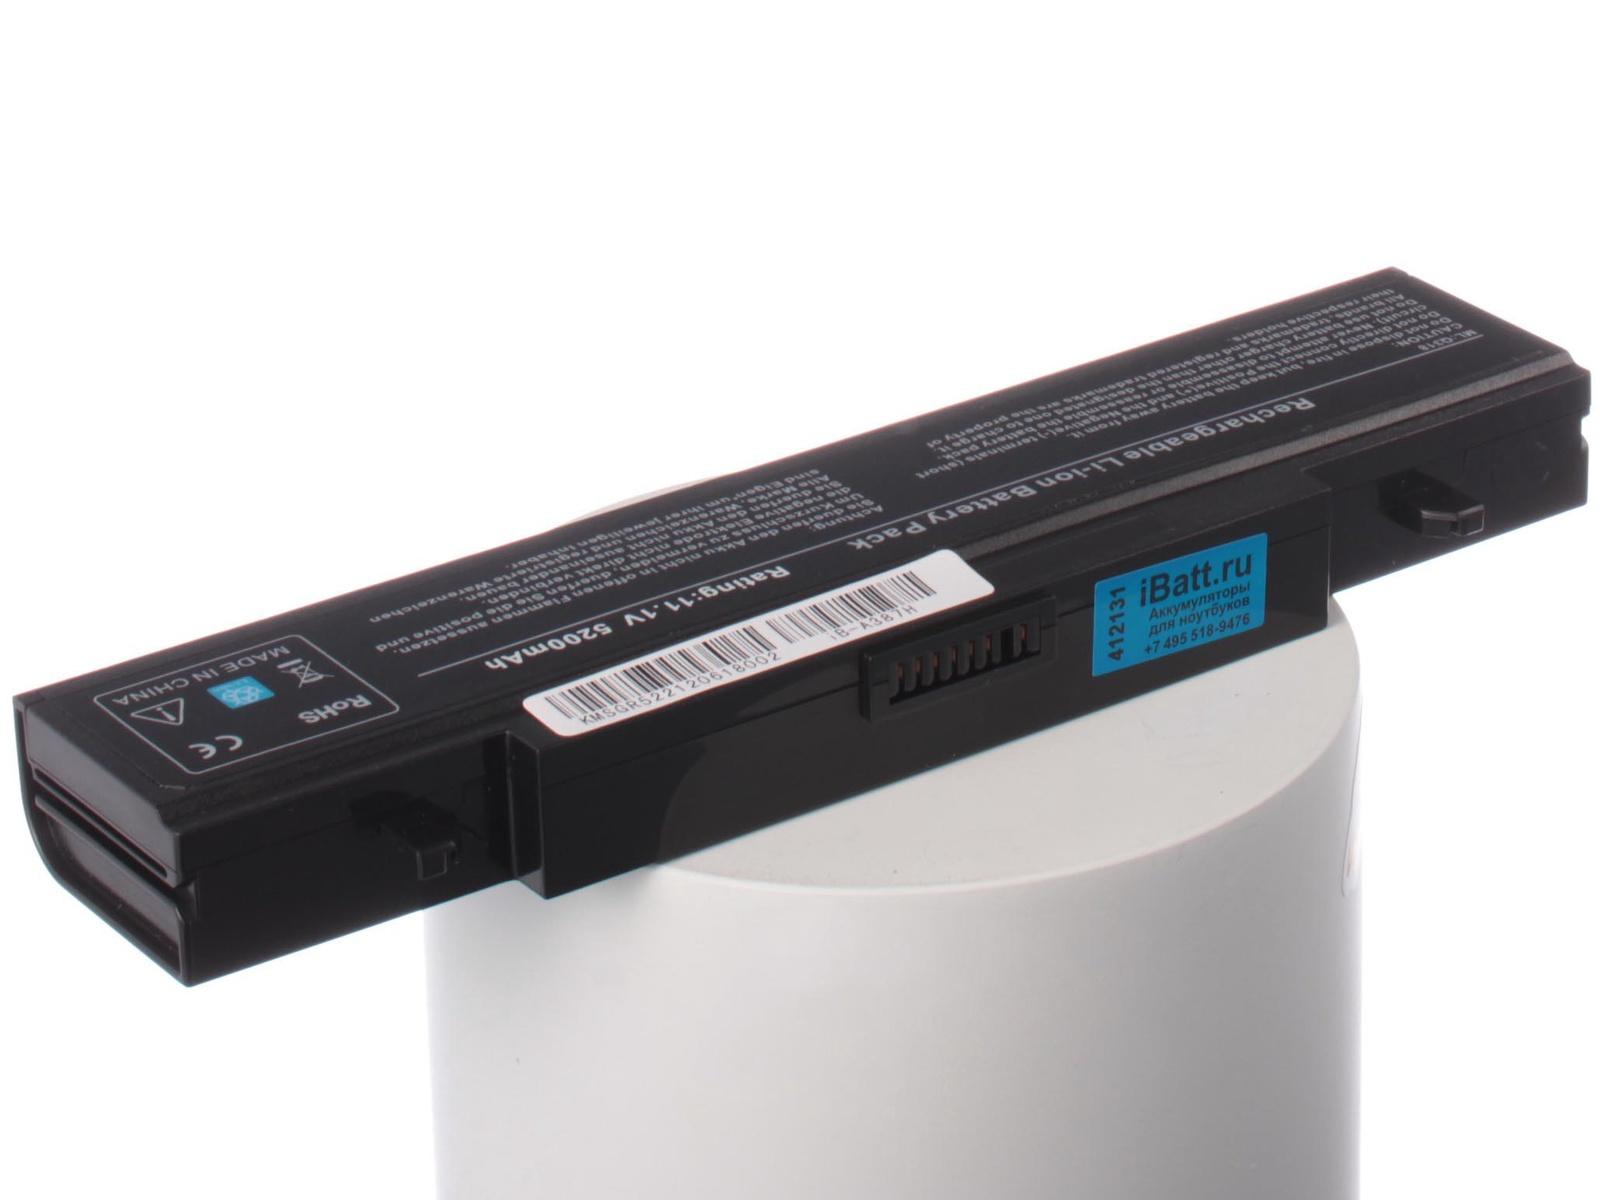 Аккумулятор для ноутбука iBatt для Samsung 300V5A-S10, 550P7C, 550P5C-S03, NP-R720, 310E5C, 350E5C-S04, 355V4C-S01, R408, 300V4A-A06, RC530-S04, 300V5A-S1A, NP-R460, 300E5Z-A06, 300E5A-S0E, NP-R440, NP-R517, RF511-S02 аккумулятор для ноутбука ibatt для samsung 300v5a s10 550p7c 550p5c s03 np r720 310e5c 350e5c s04 355v4c s01 r408 300v4a a06 rc530 s04 300v5a s1a np r460 300e5z a06 300e5a s0e np r440 np r517 rf511 s02